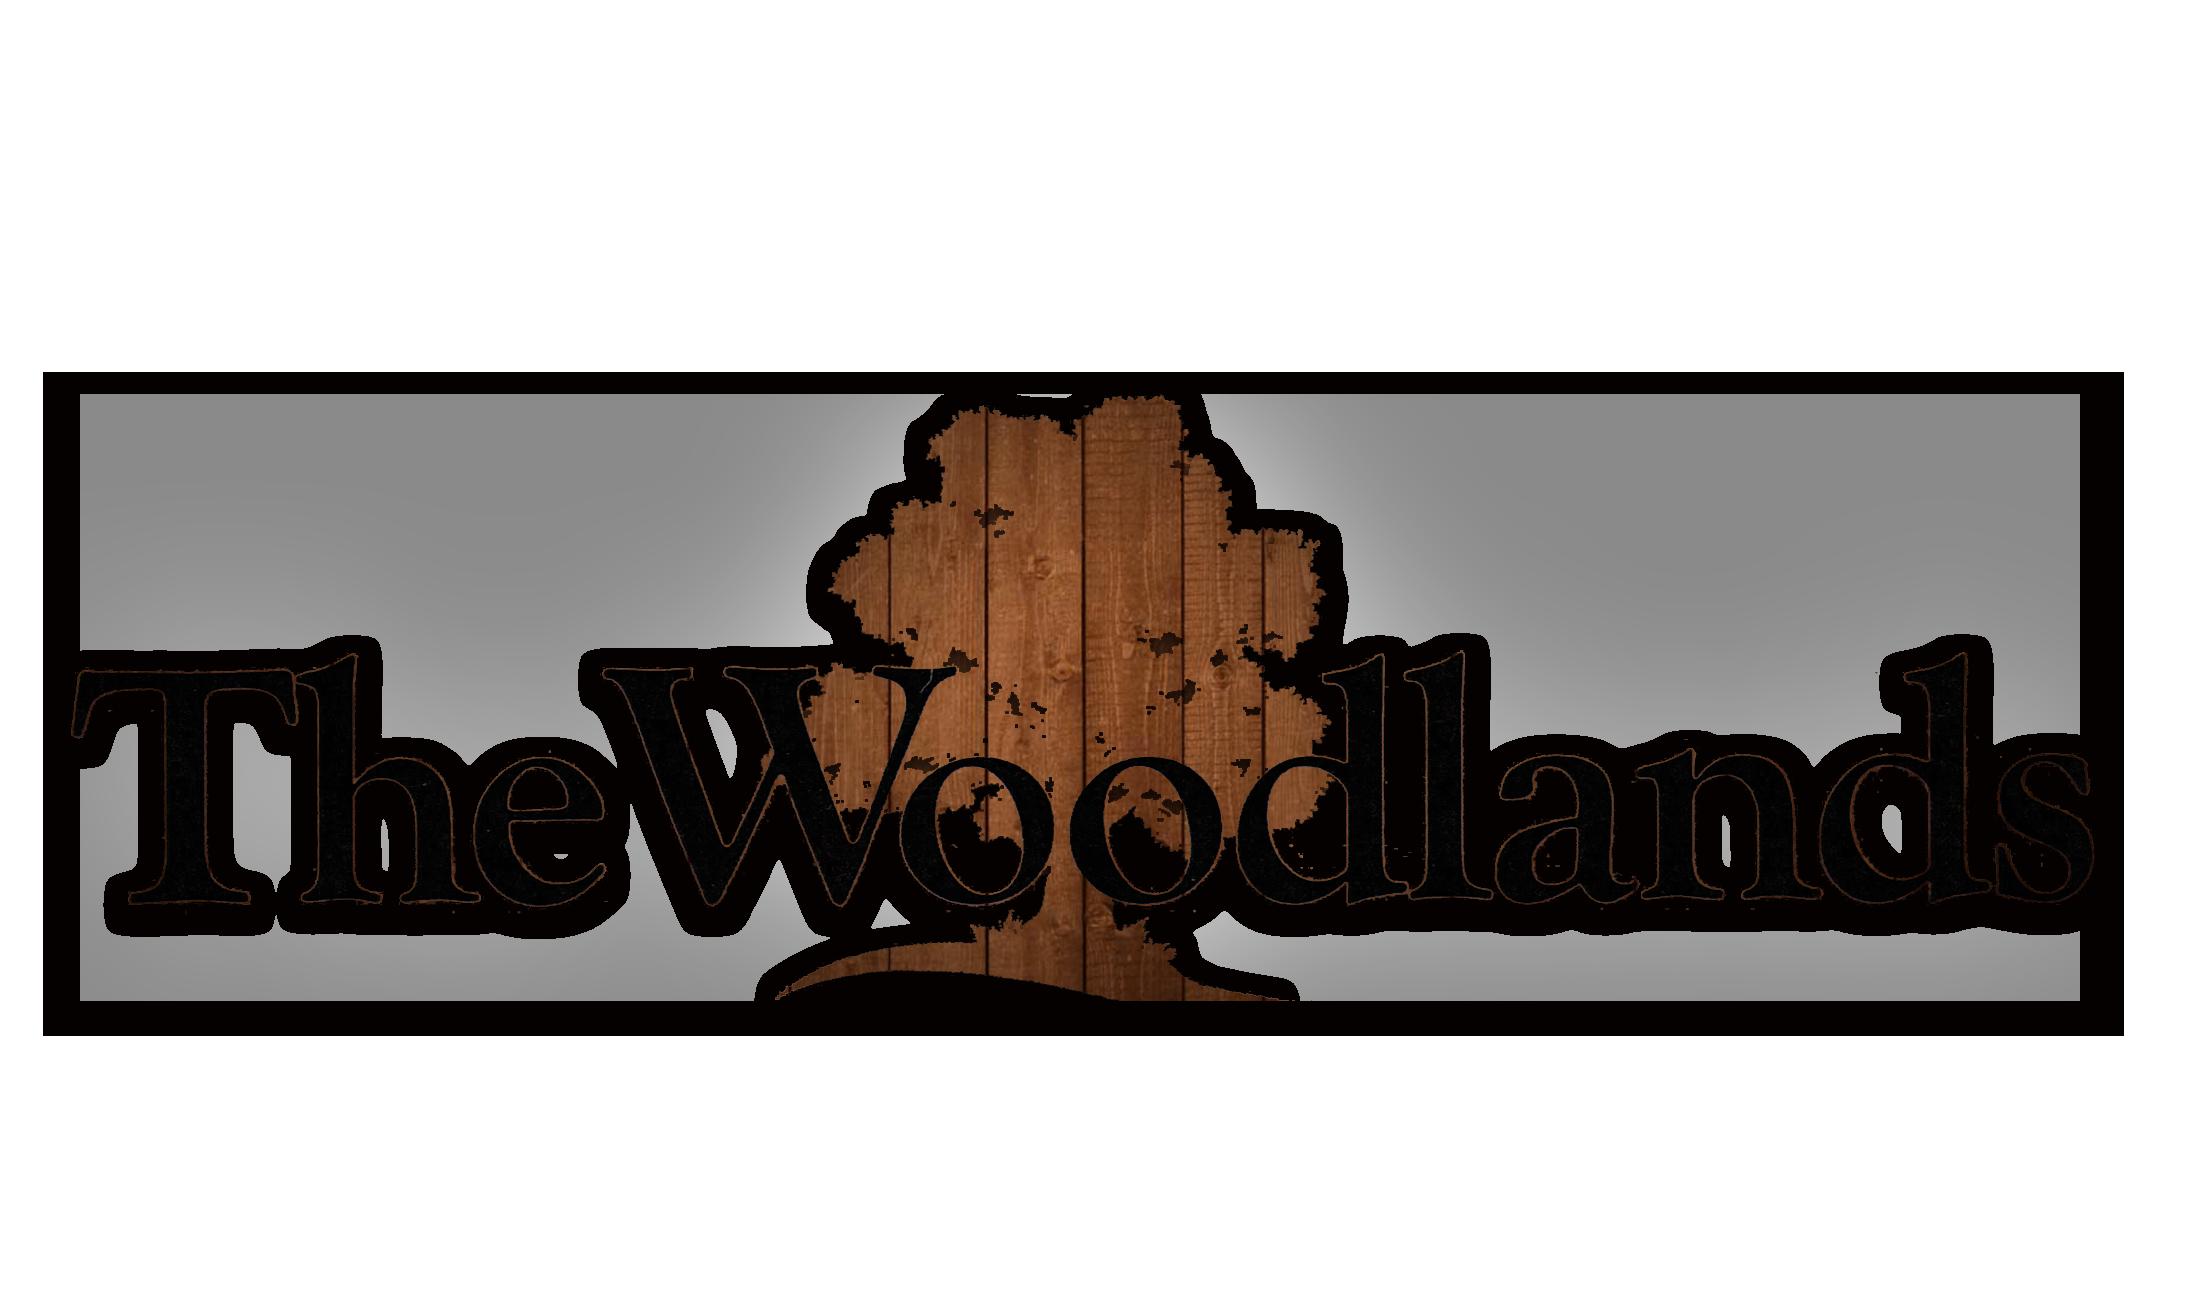 The Woodlands logo woodgrain contrast